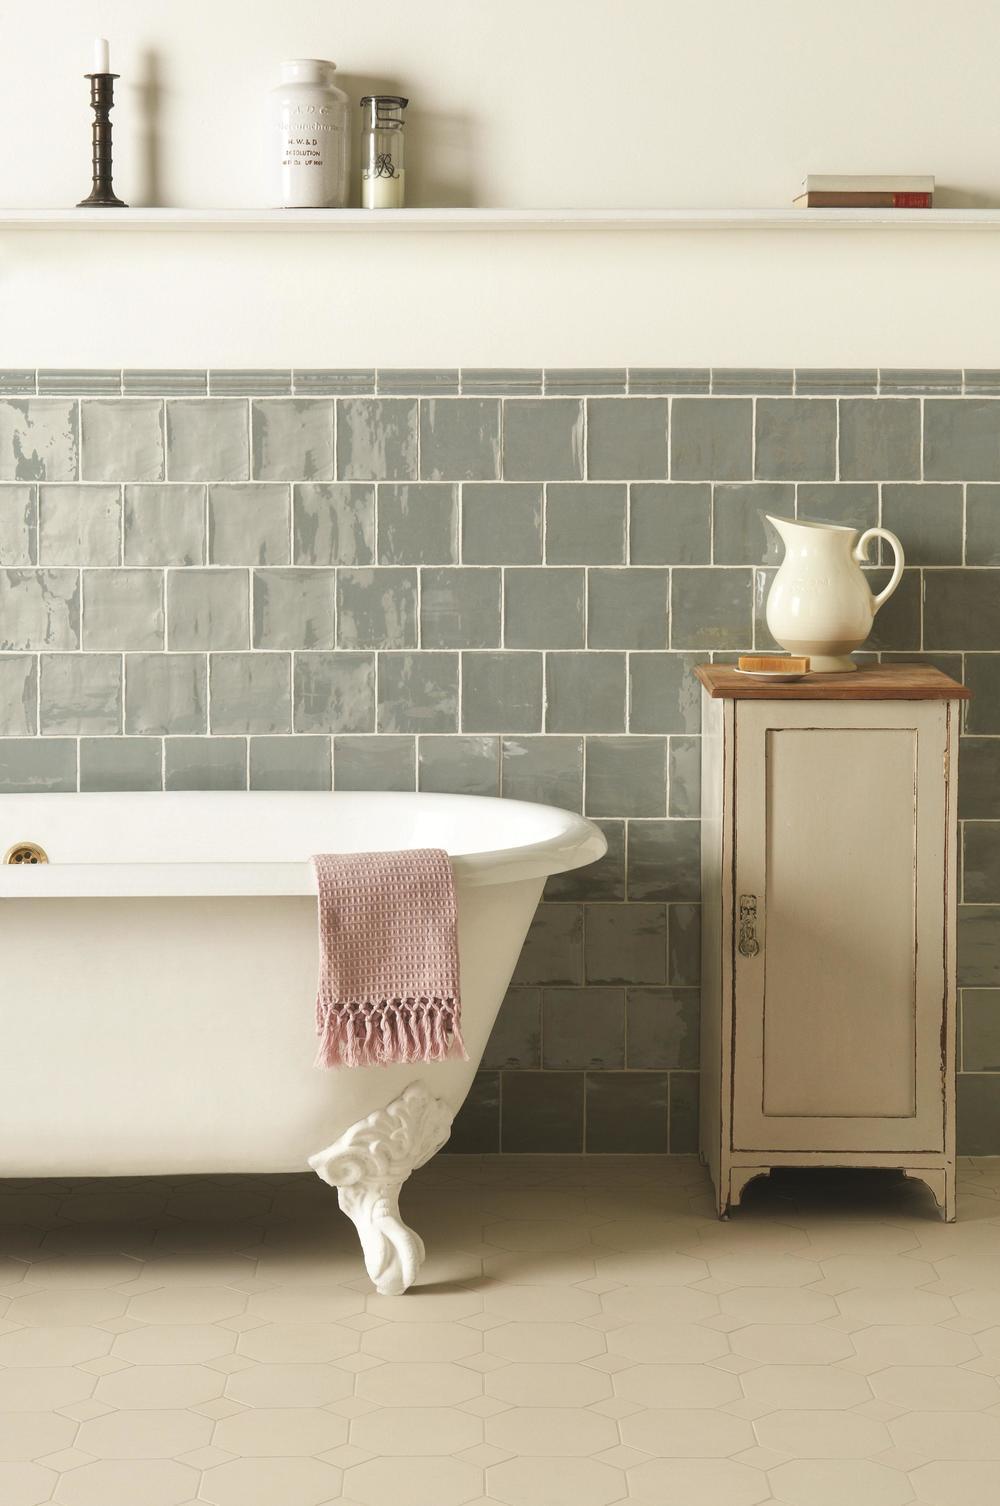 Original Style - VFT - Dover White York pattern with Winchester Metropolitan Lazul wall tiles _2.jpg